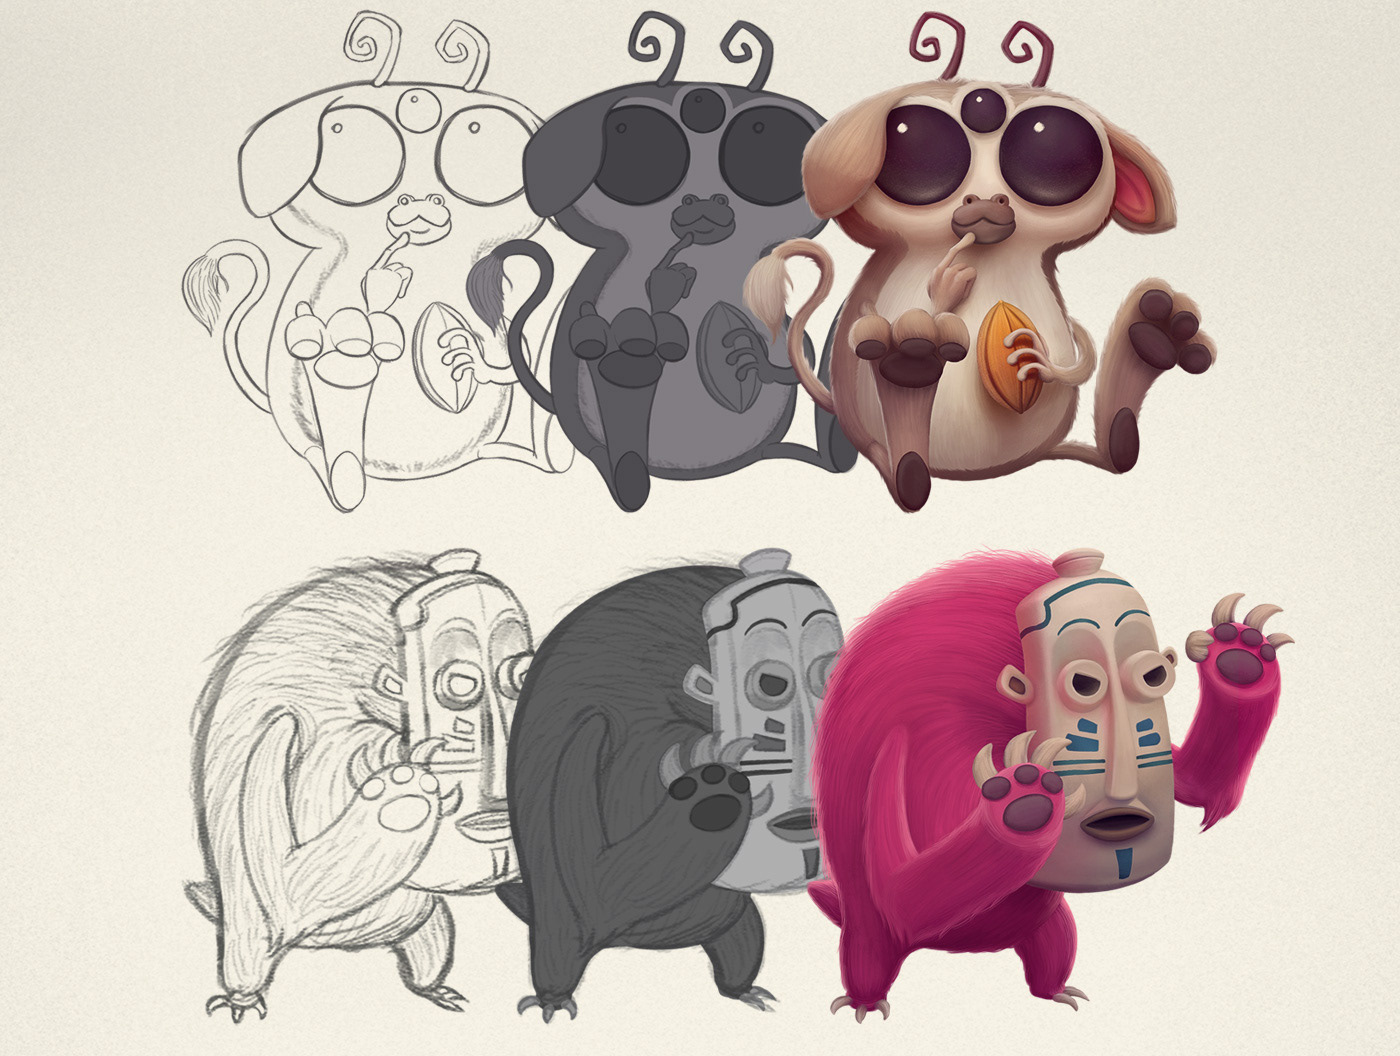 Character Design and Illustration, Cartooning